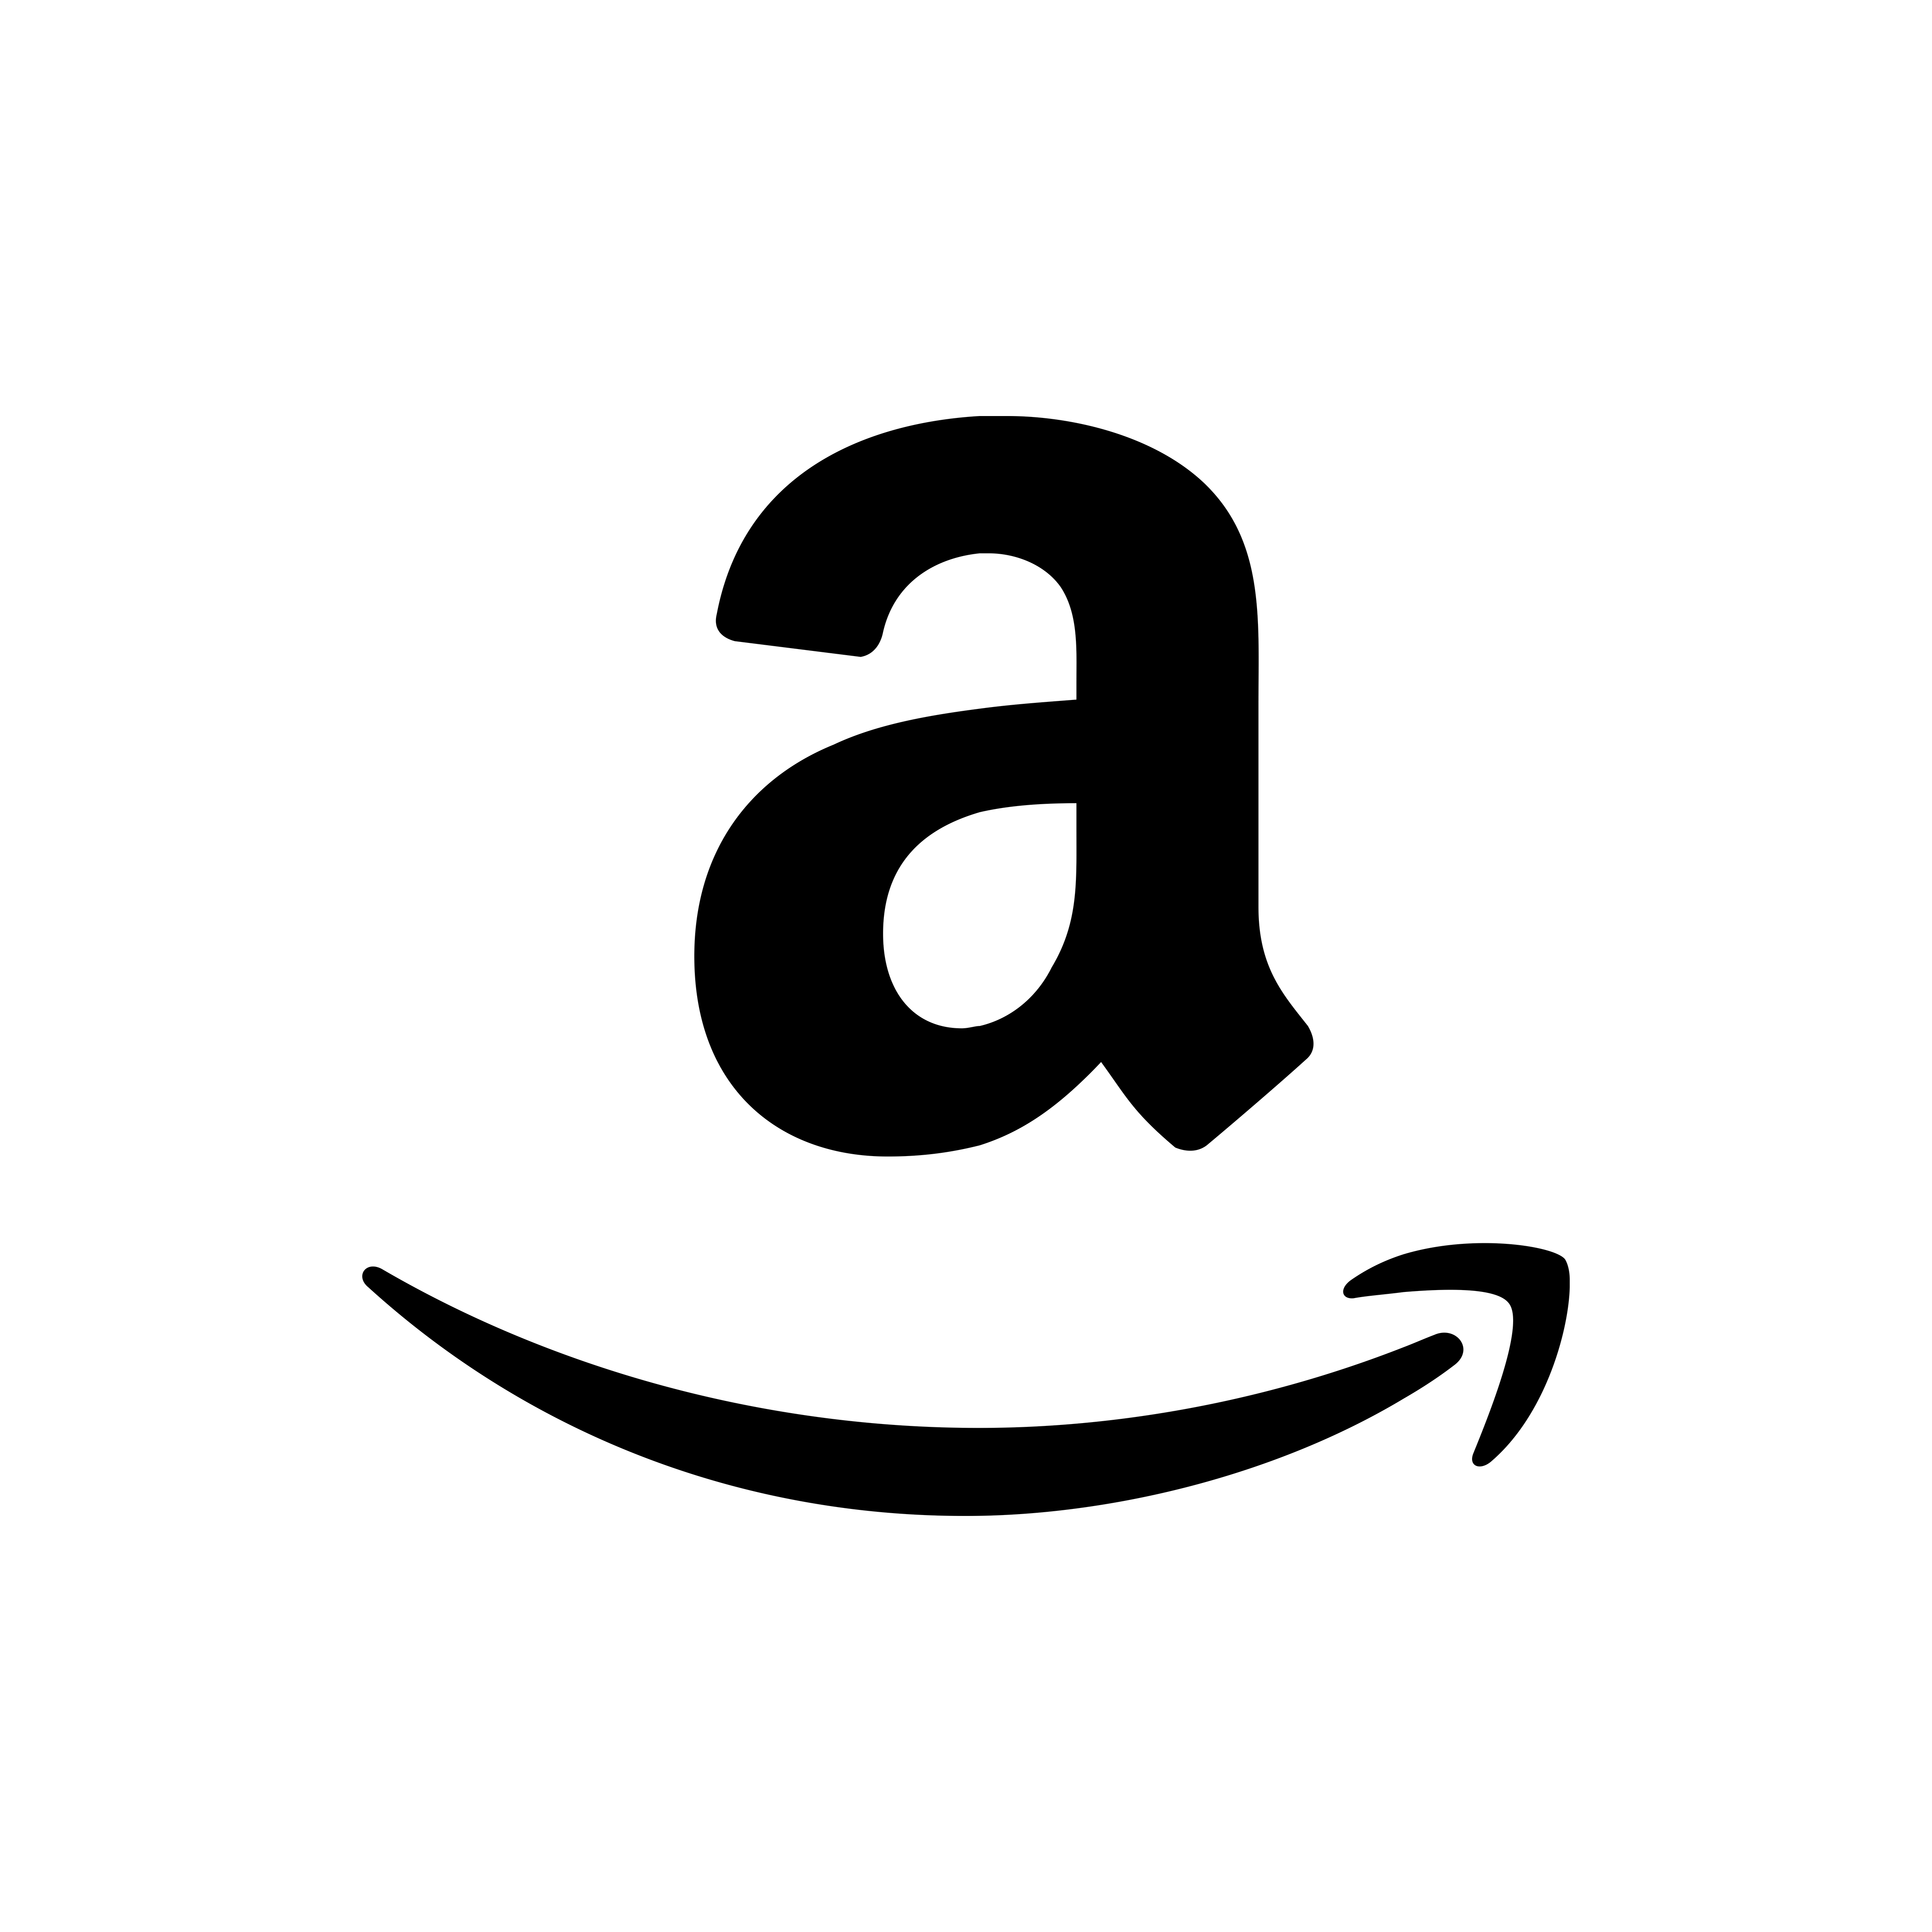 amazon, black icon